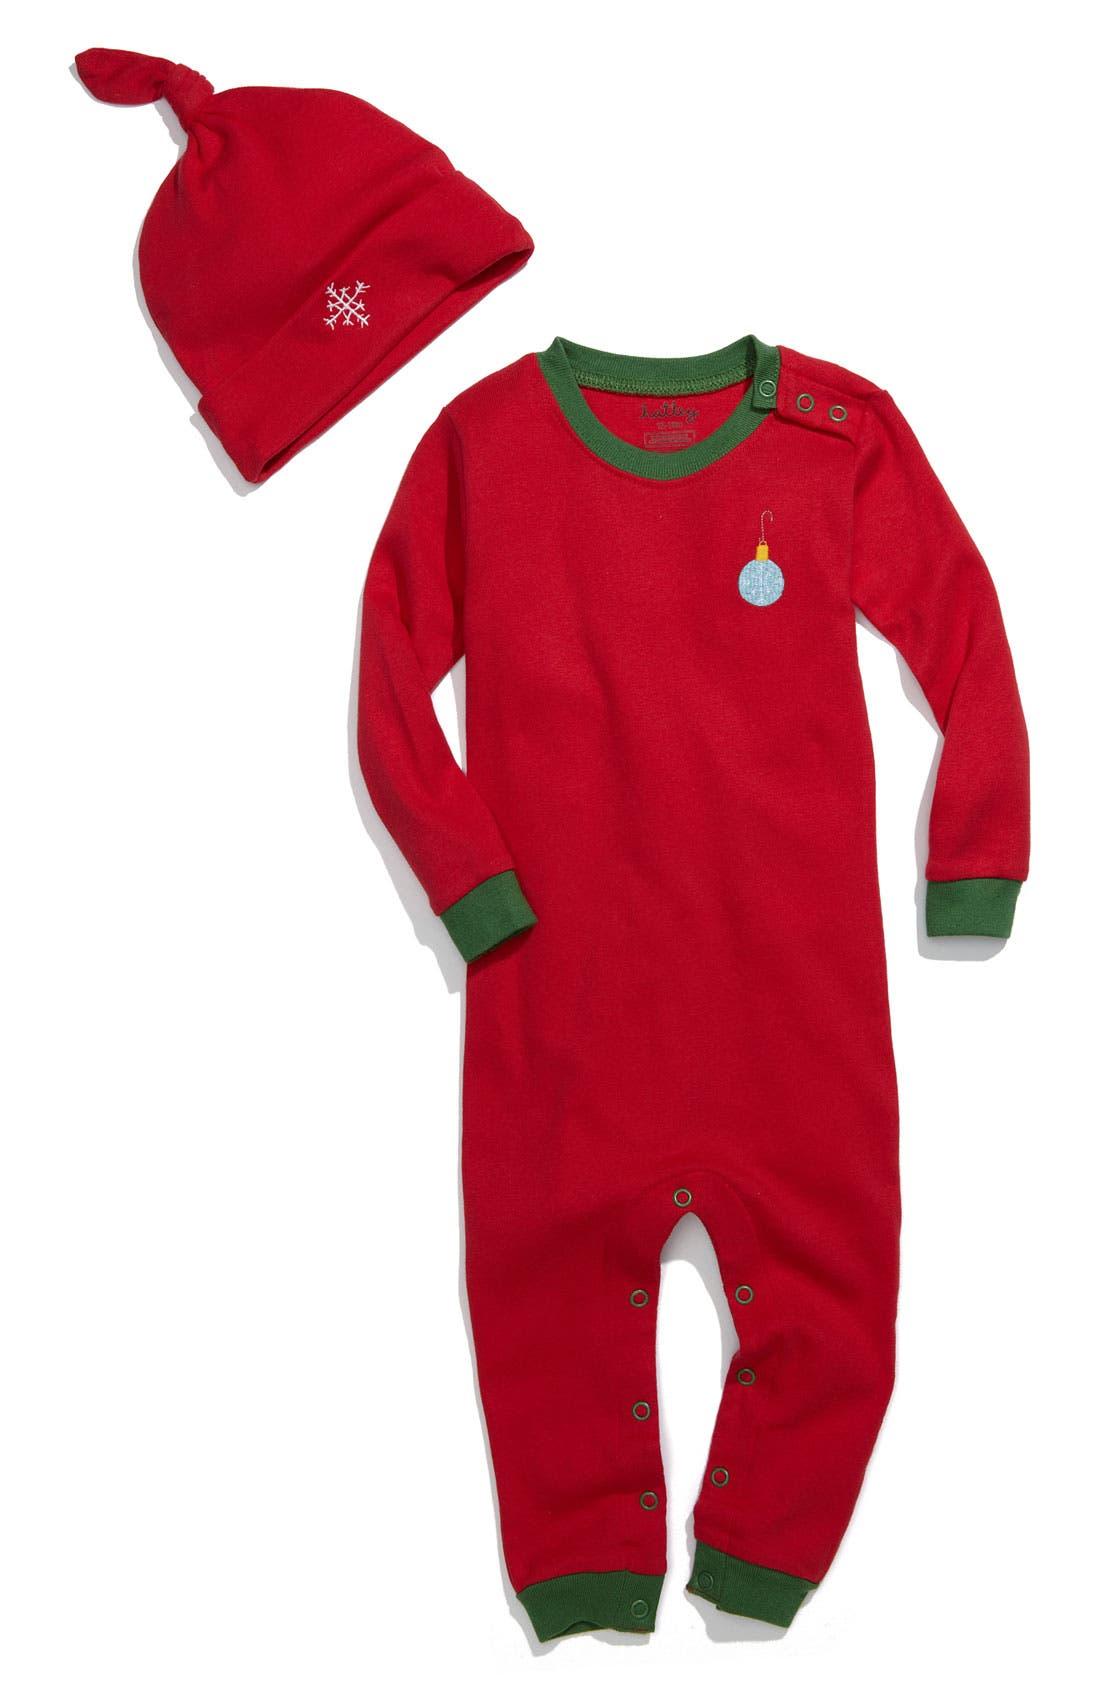 Main Image - Hatley Fitted Romper & Hat Set (Infant)